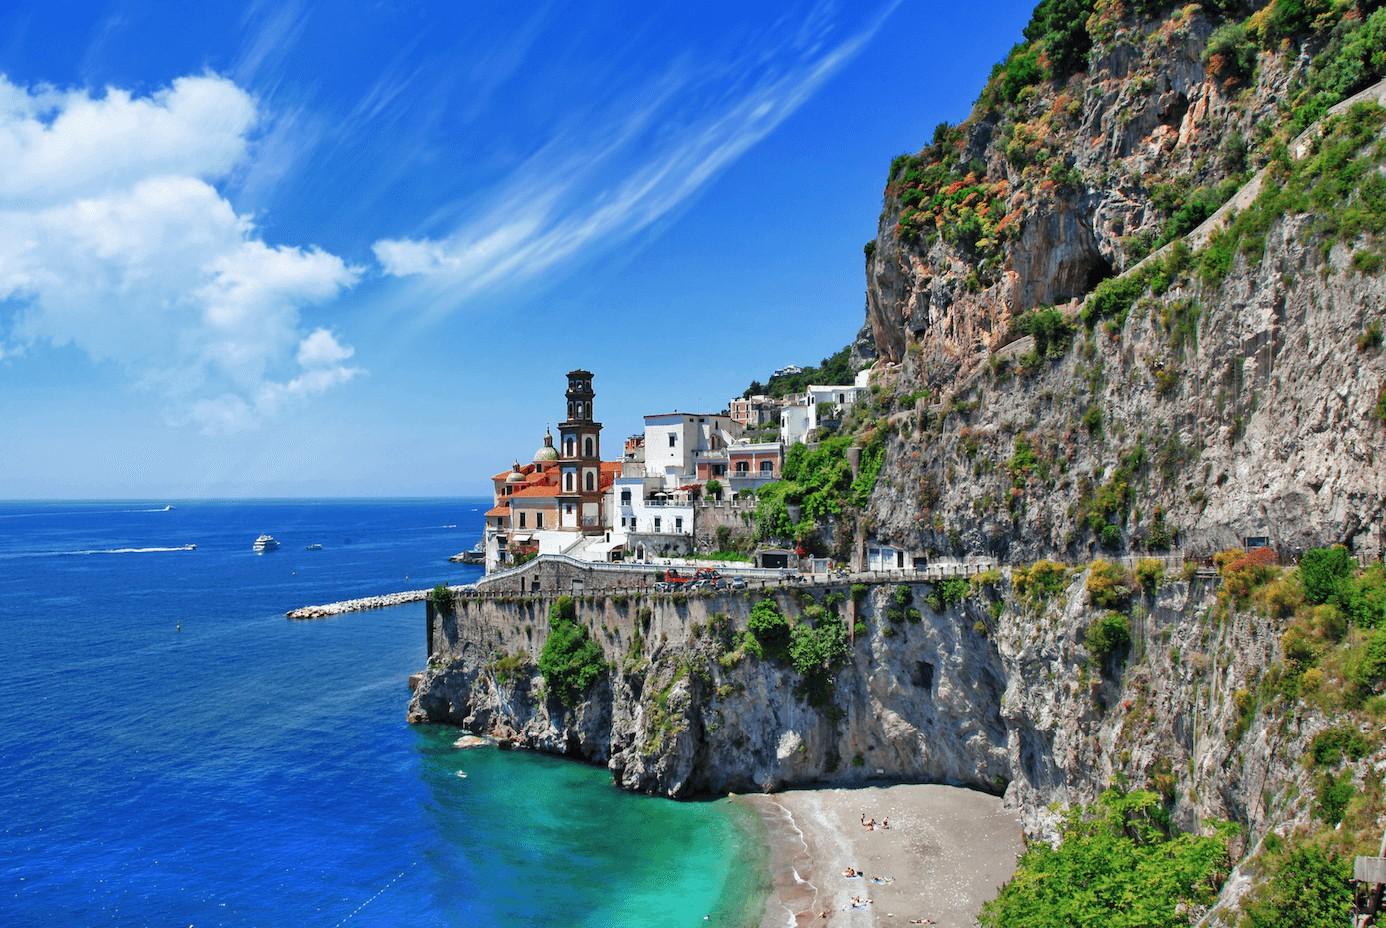 positano-yacht-rental-rent-yacht-positano-atrani-emerald-coast